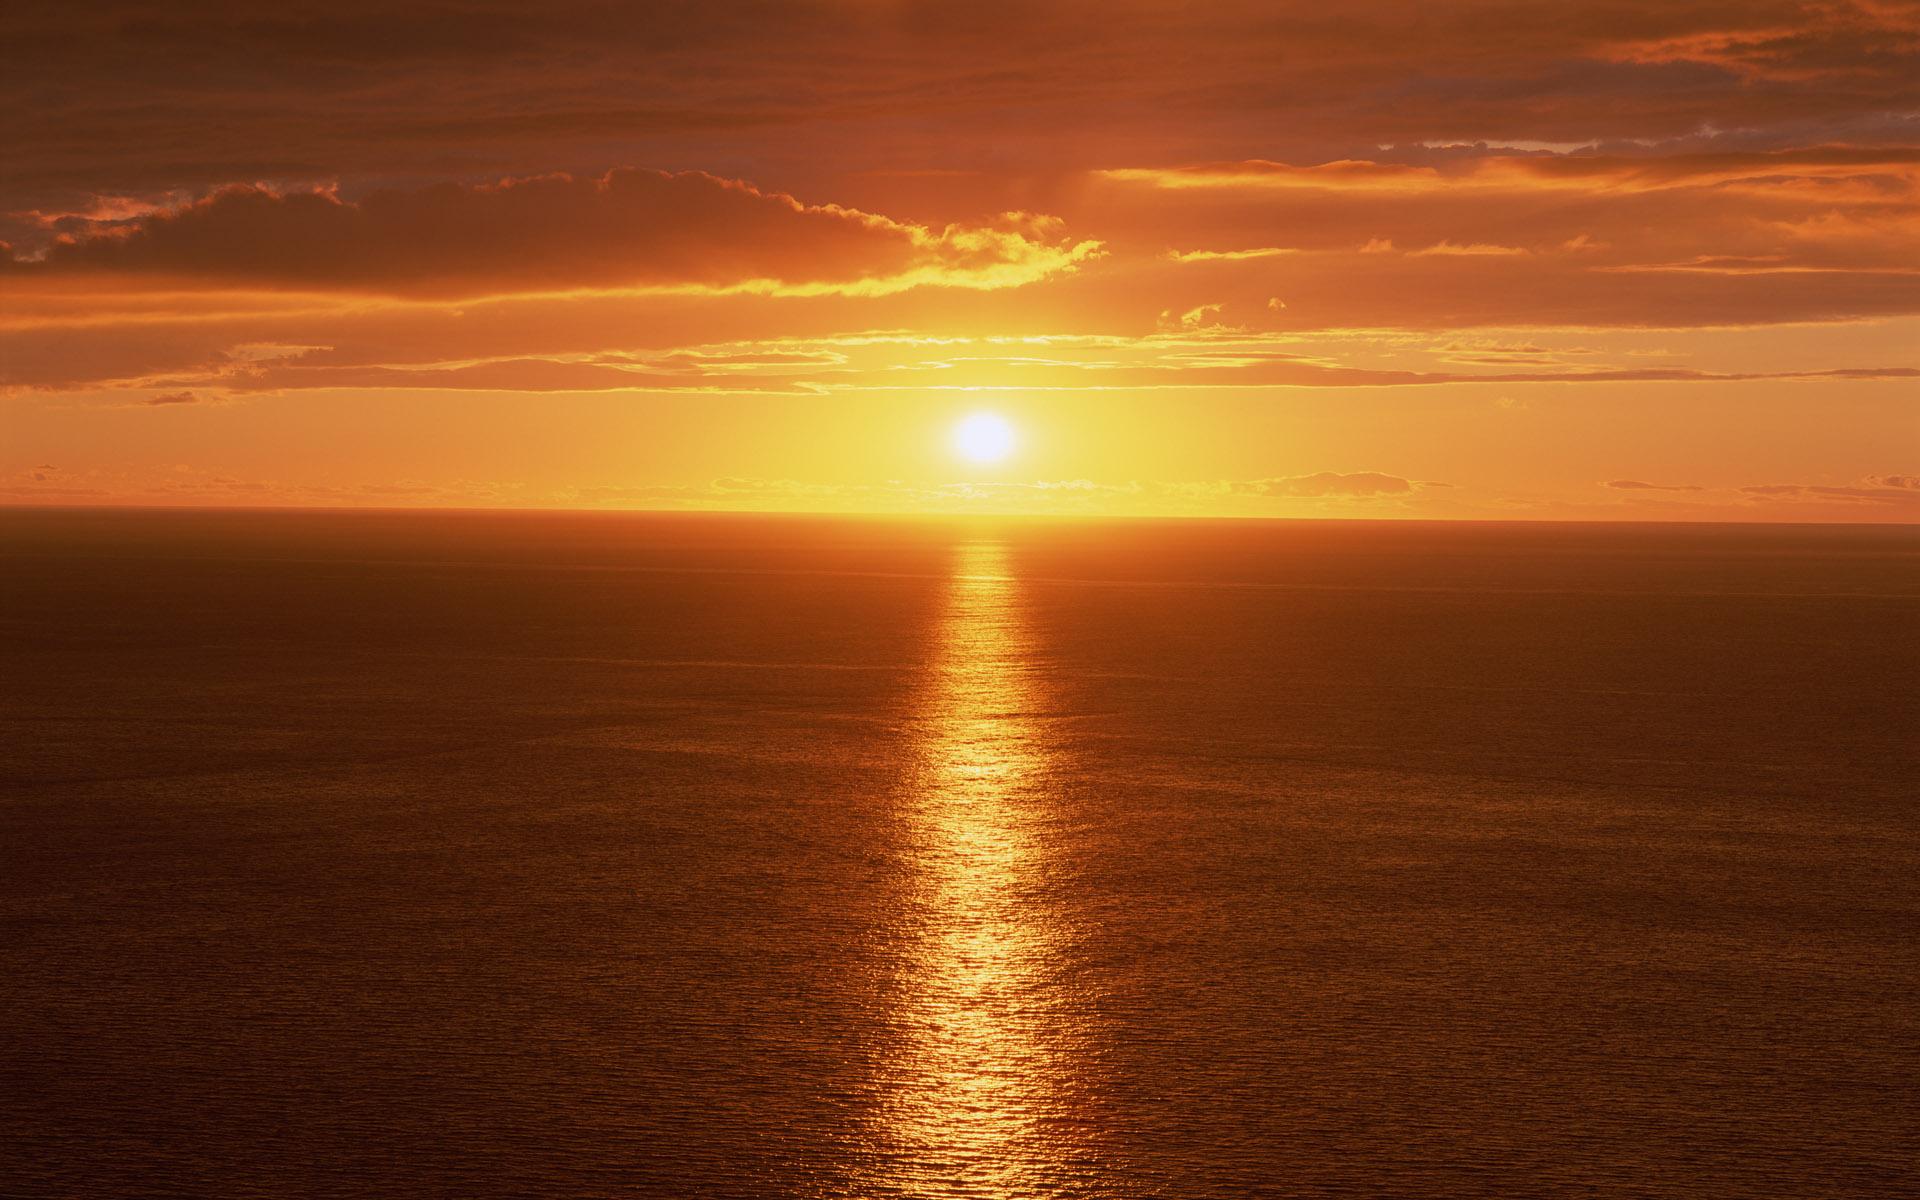 Evening-sun-path